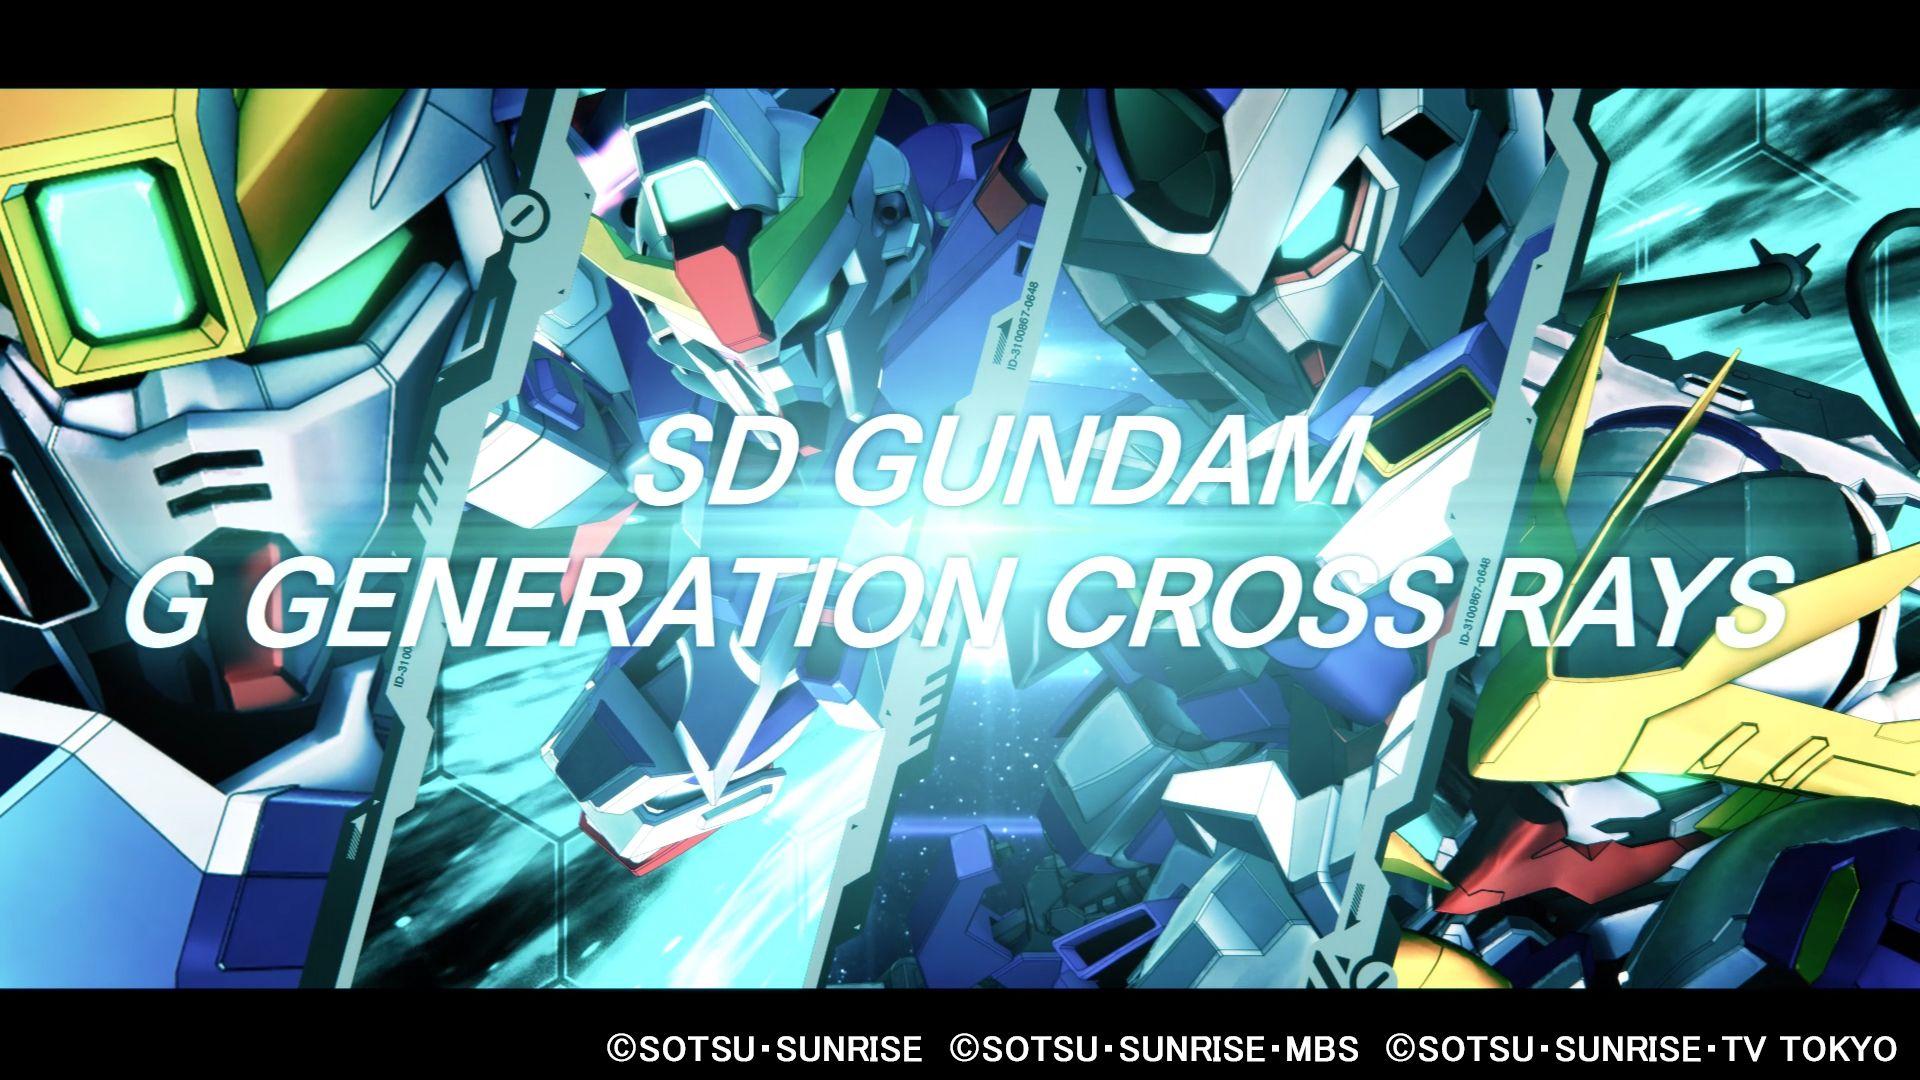 Gundam G Generation Cross Rays